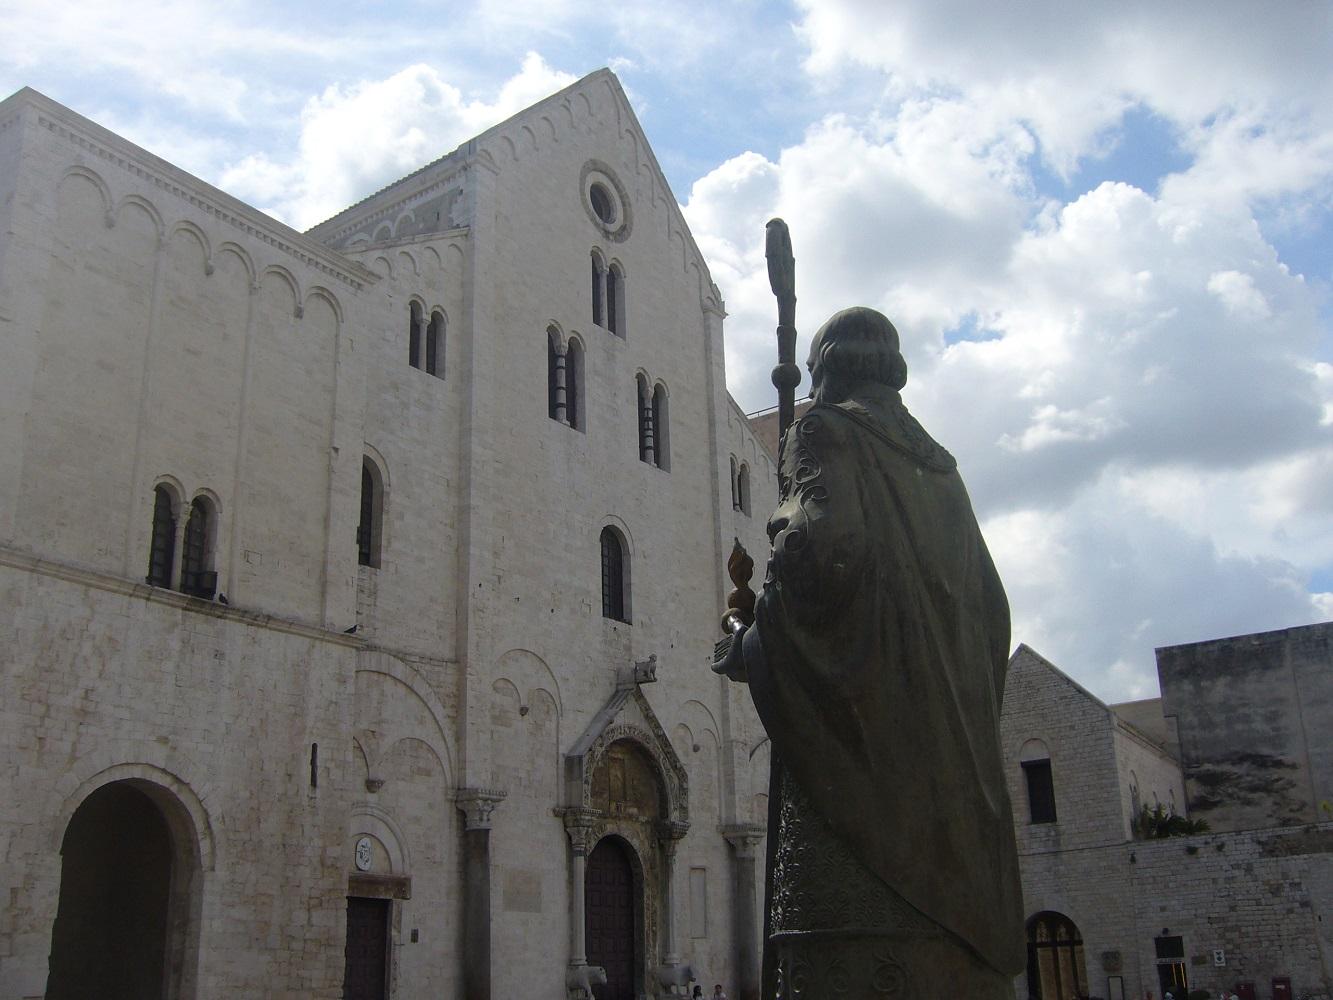 Mein Schiff Sehenswürdigkeit: Basilika San Nicola